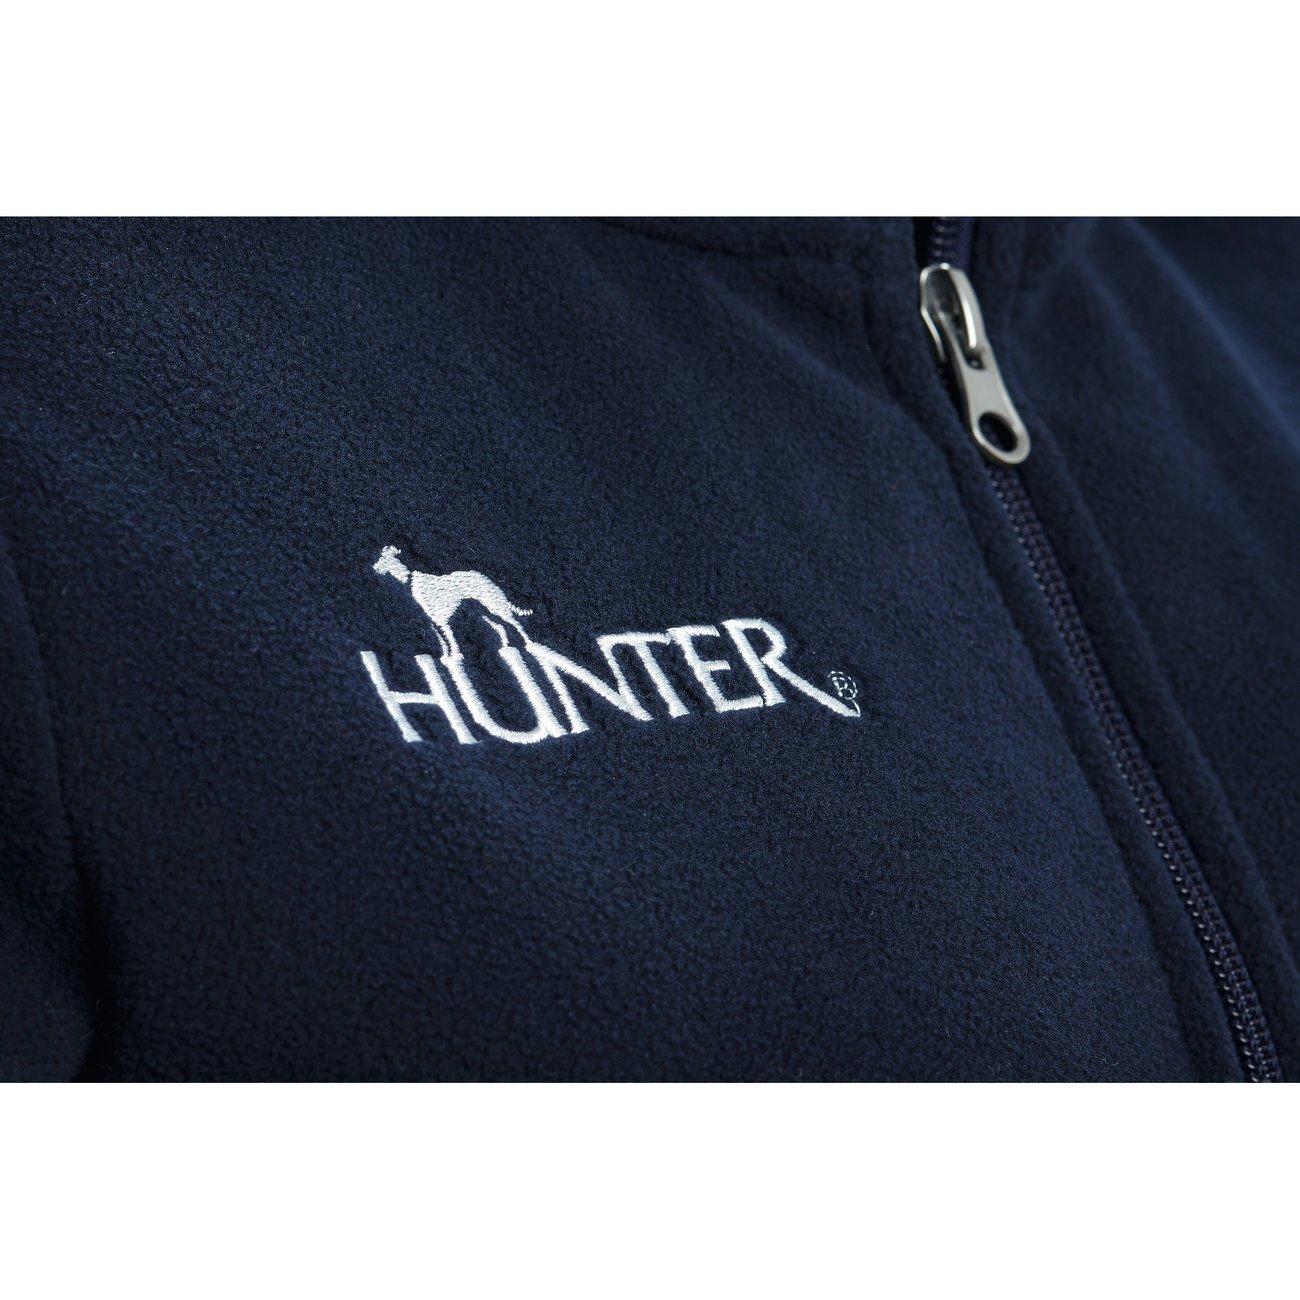 Hunter Fleecejacke HUNTER Damen , Bild 9